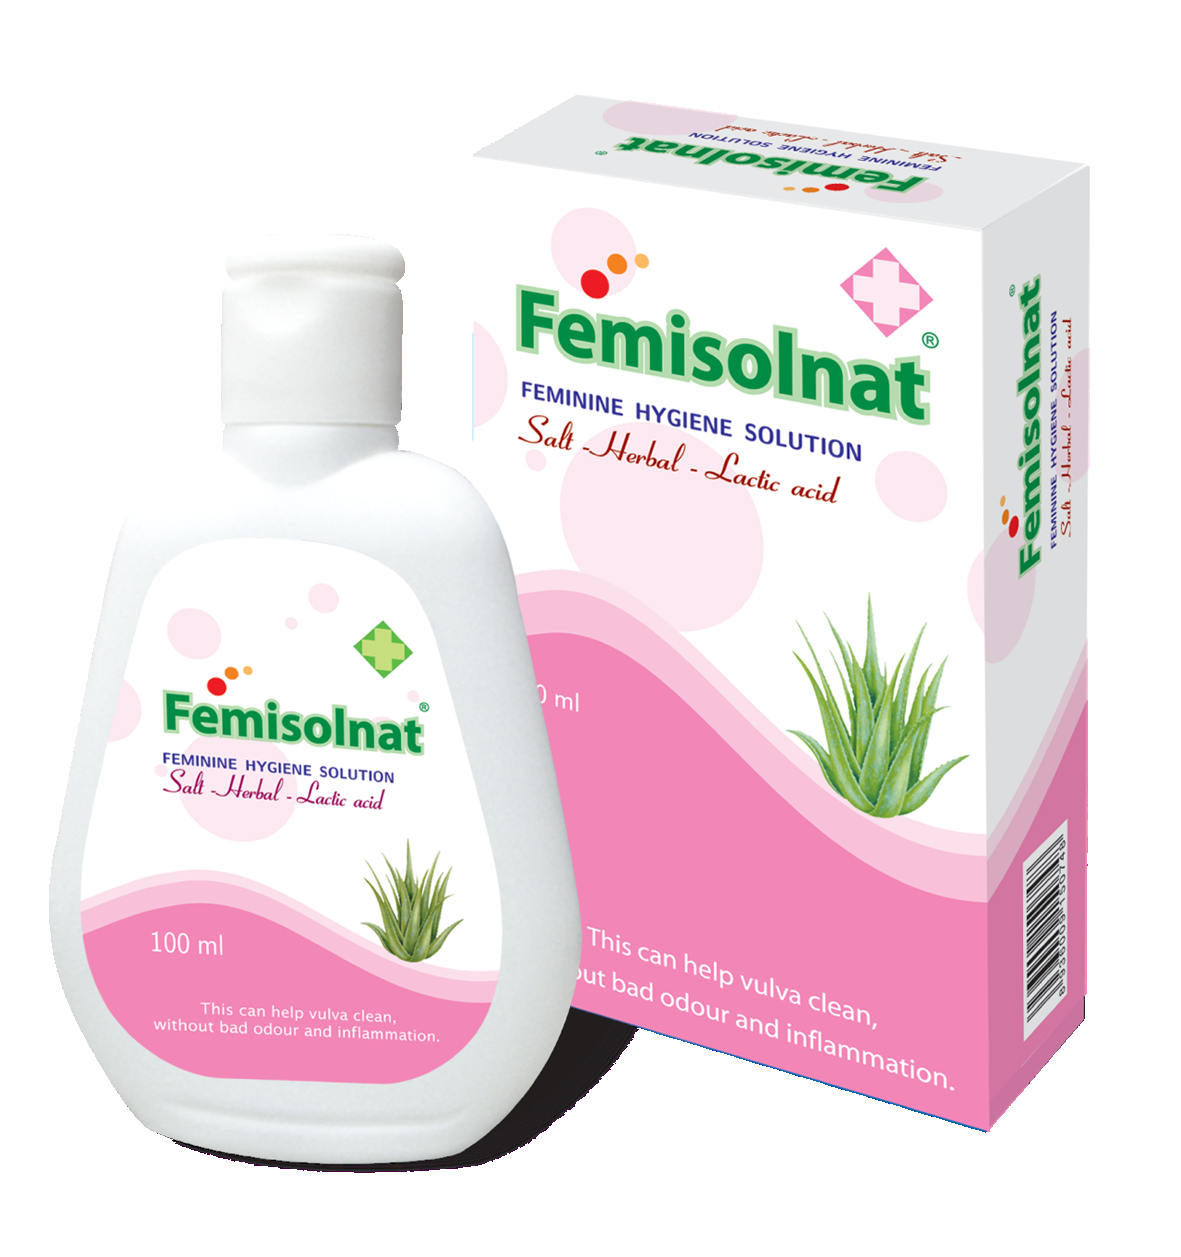 Wholesale Vietnam Best Quality Femisolnat Organic Feminine Hygiene Product/ Feminine Hygiene Wash